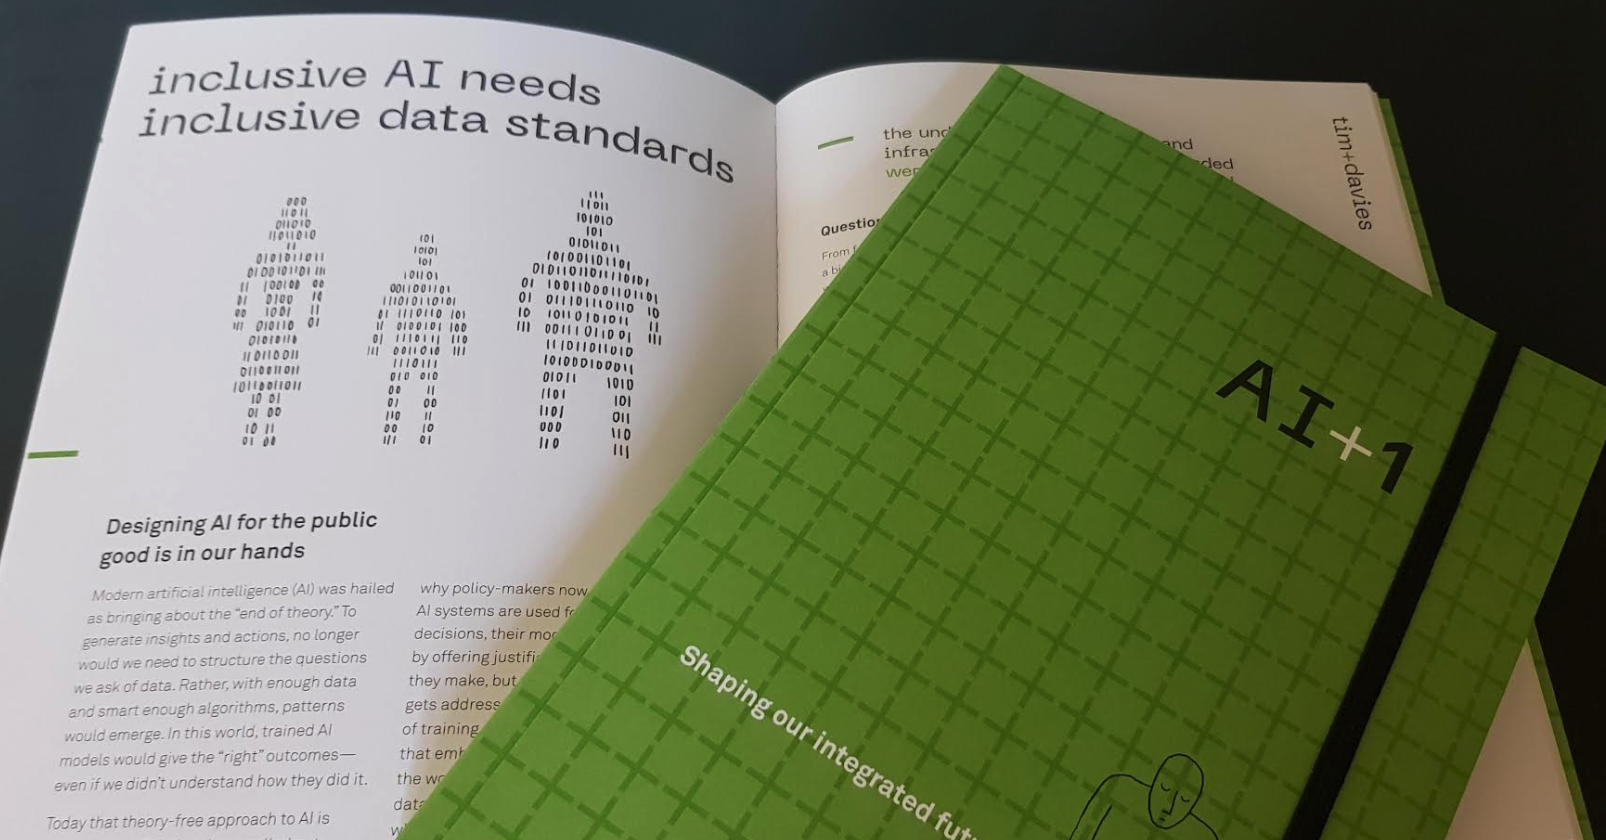 Inclusive AI needs inclusive data standards